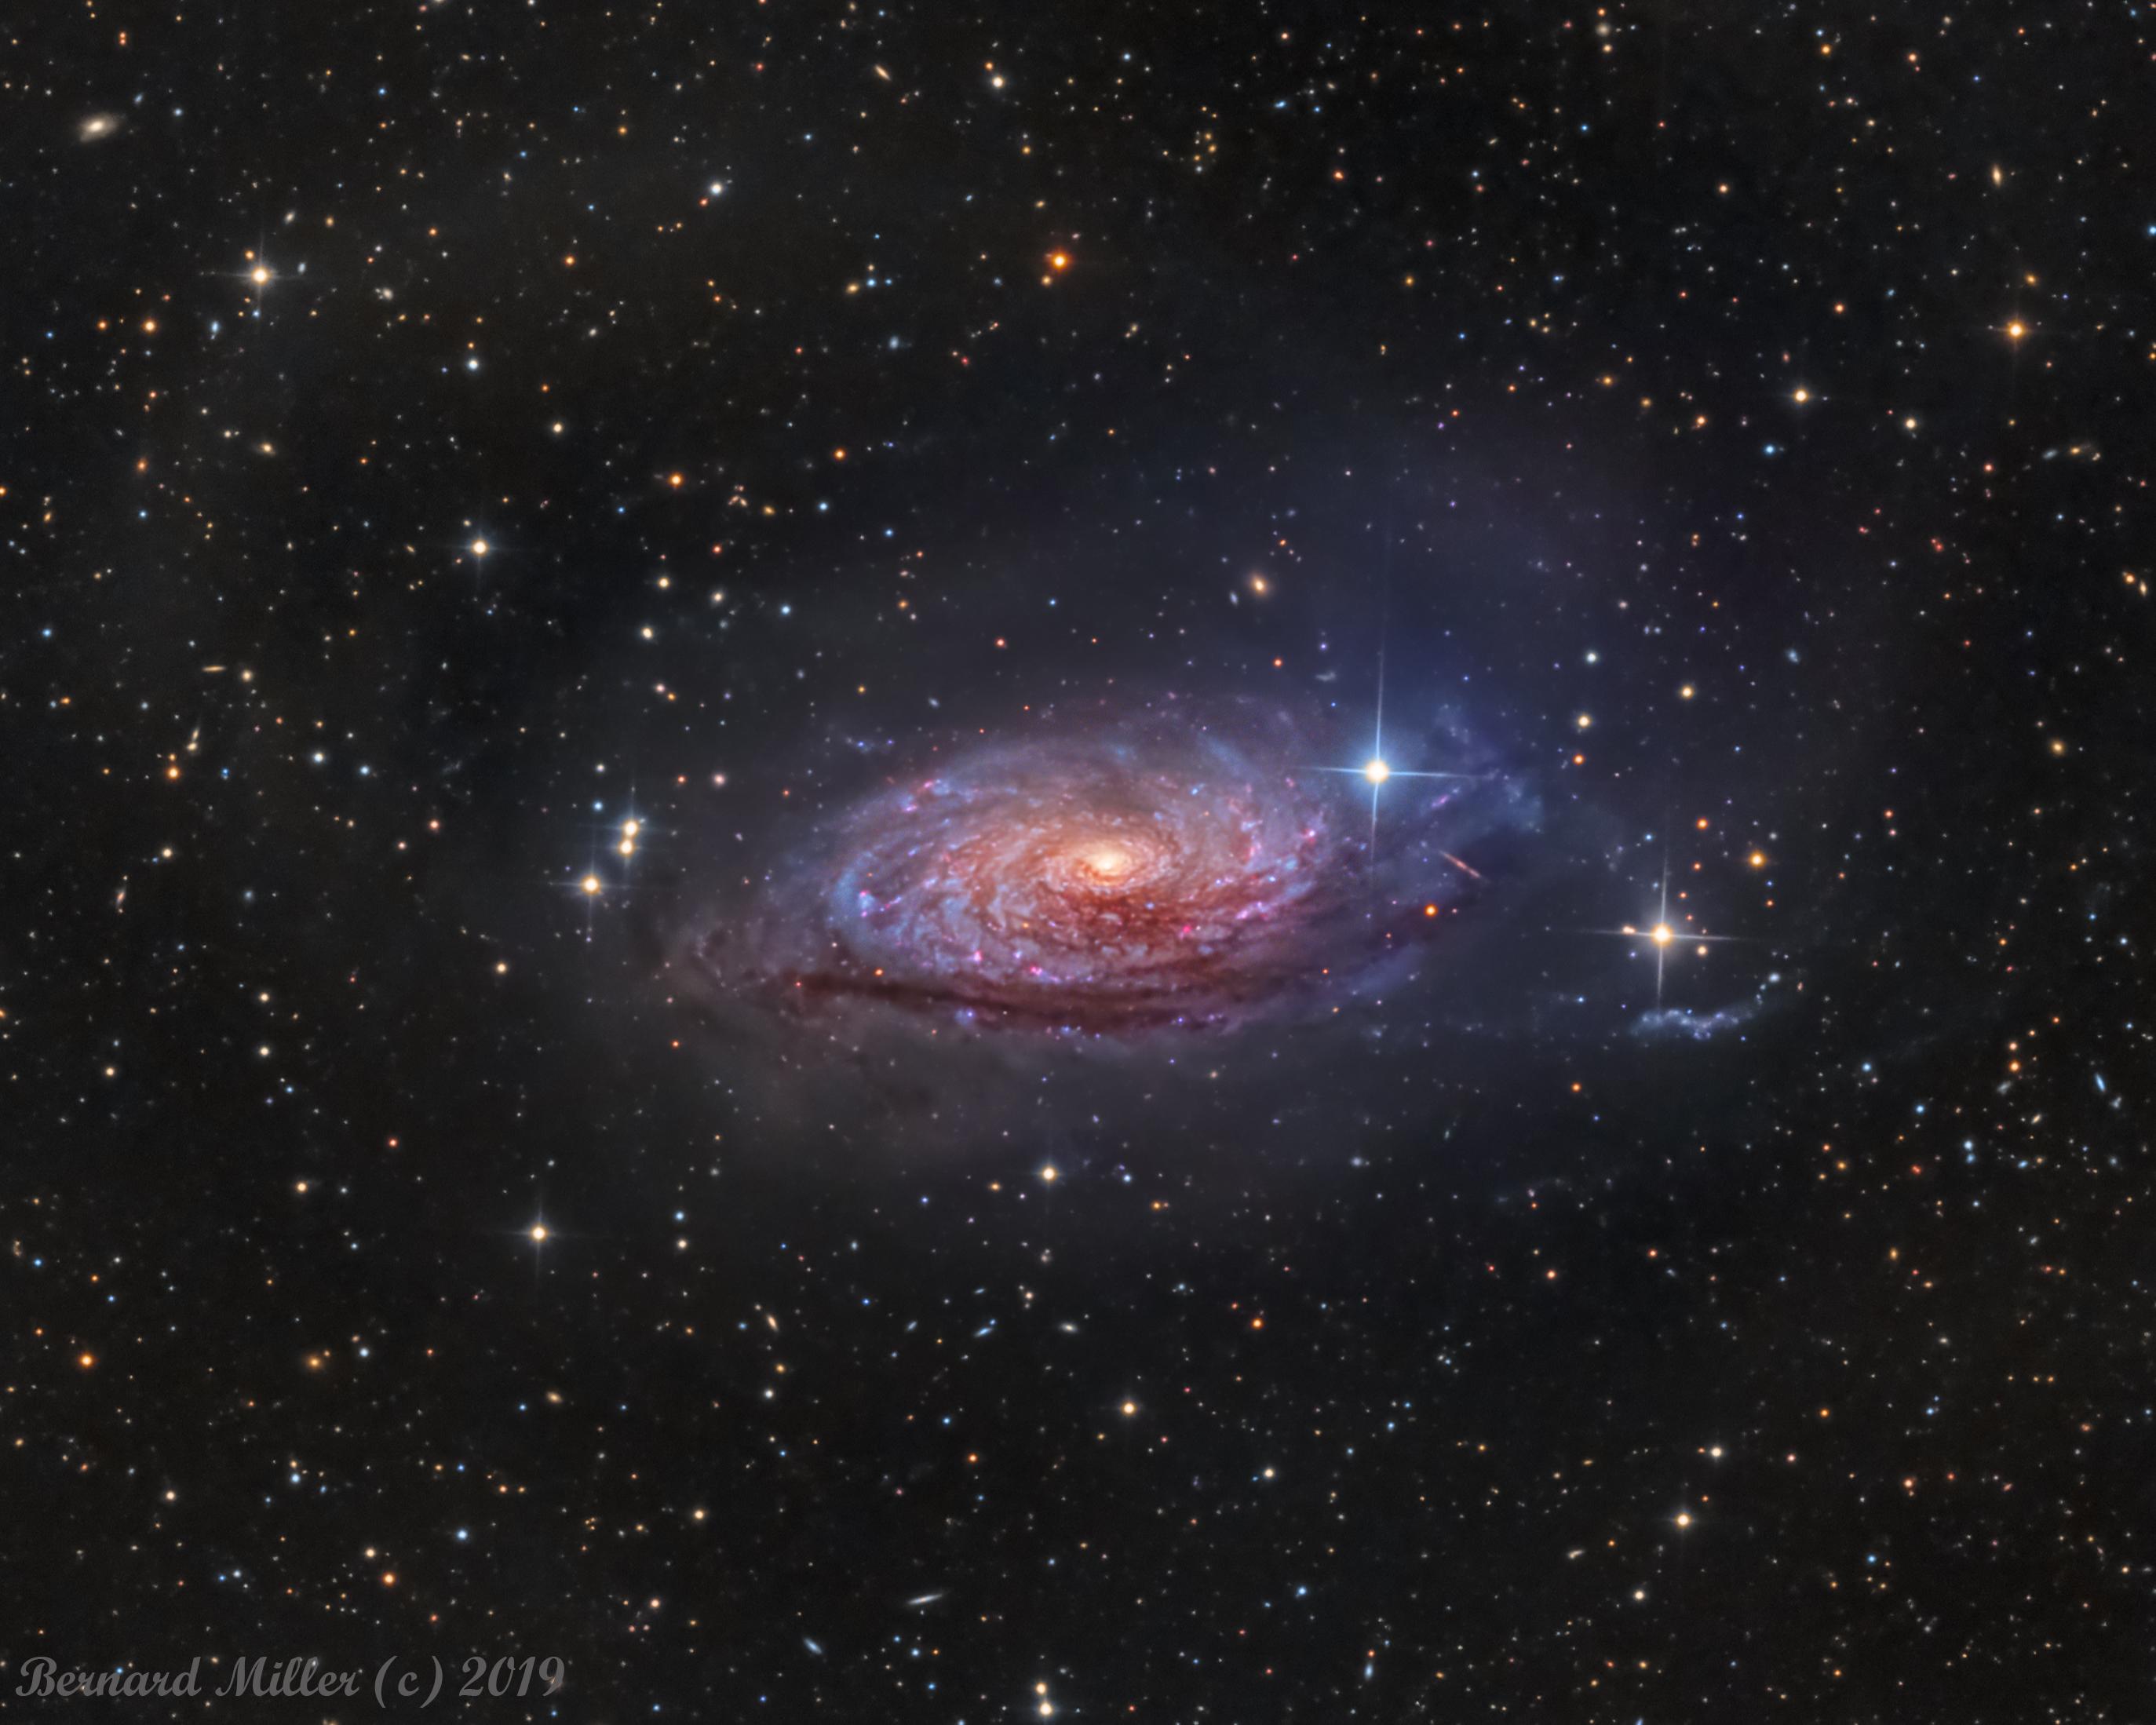 APOD: 2019 June 6 - Messier 63: The Sunflower Galaxy